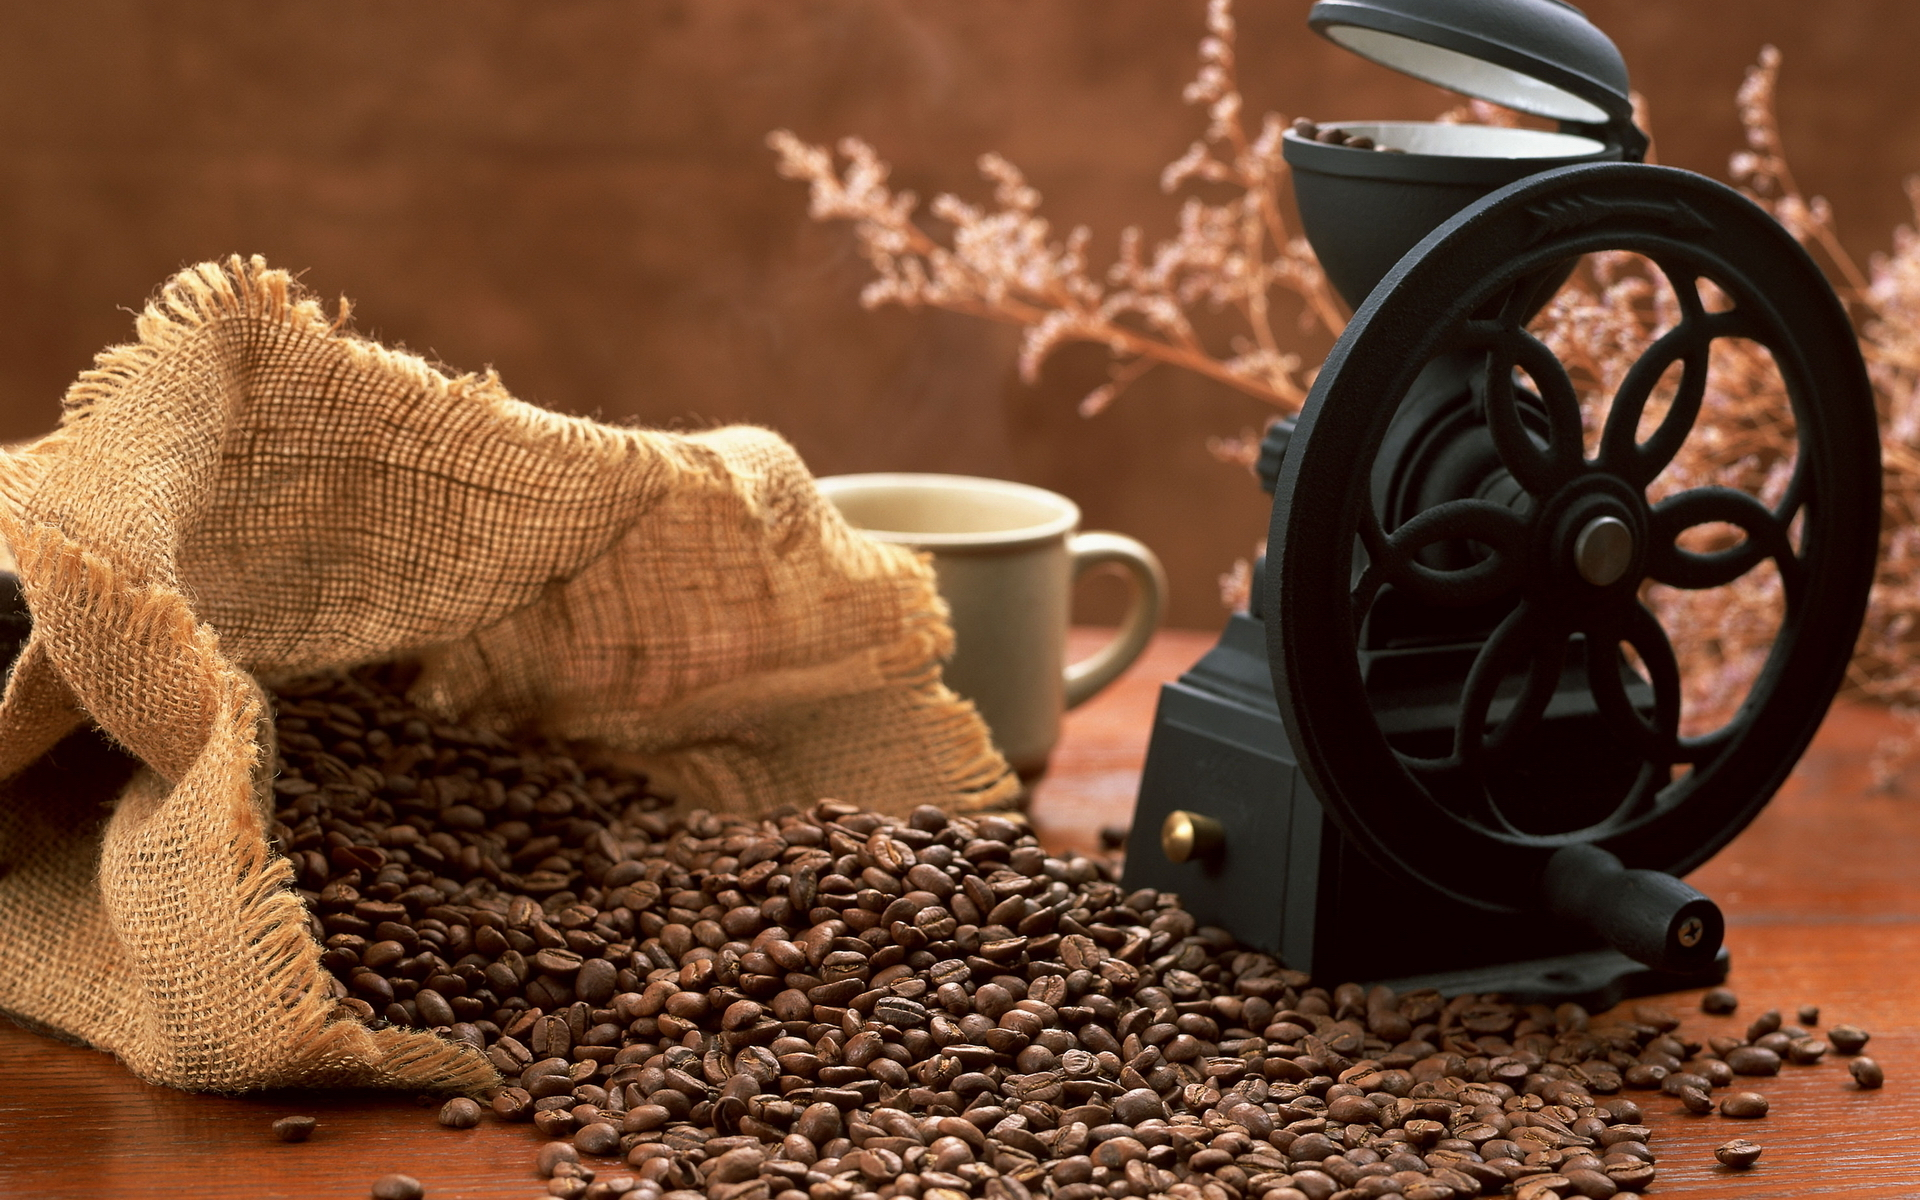 кофе, зерна, кофемолка